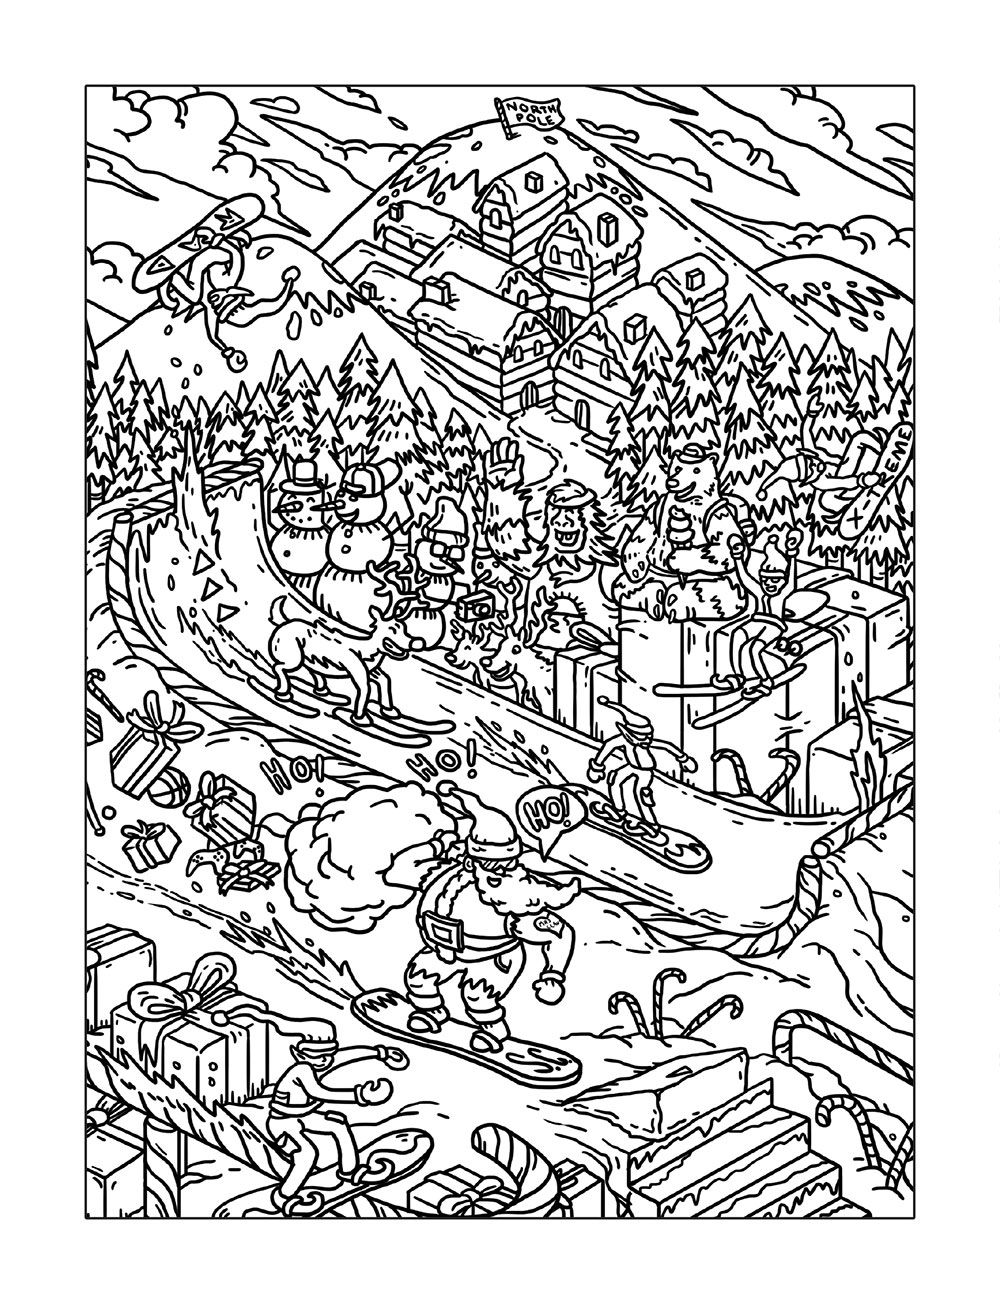 free printable coloring page depicting Santa on a snowboard